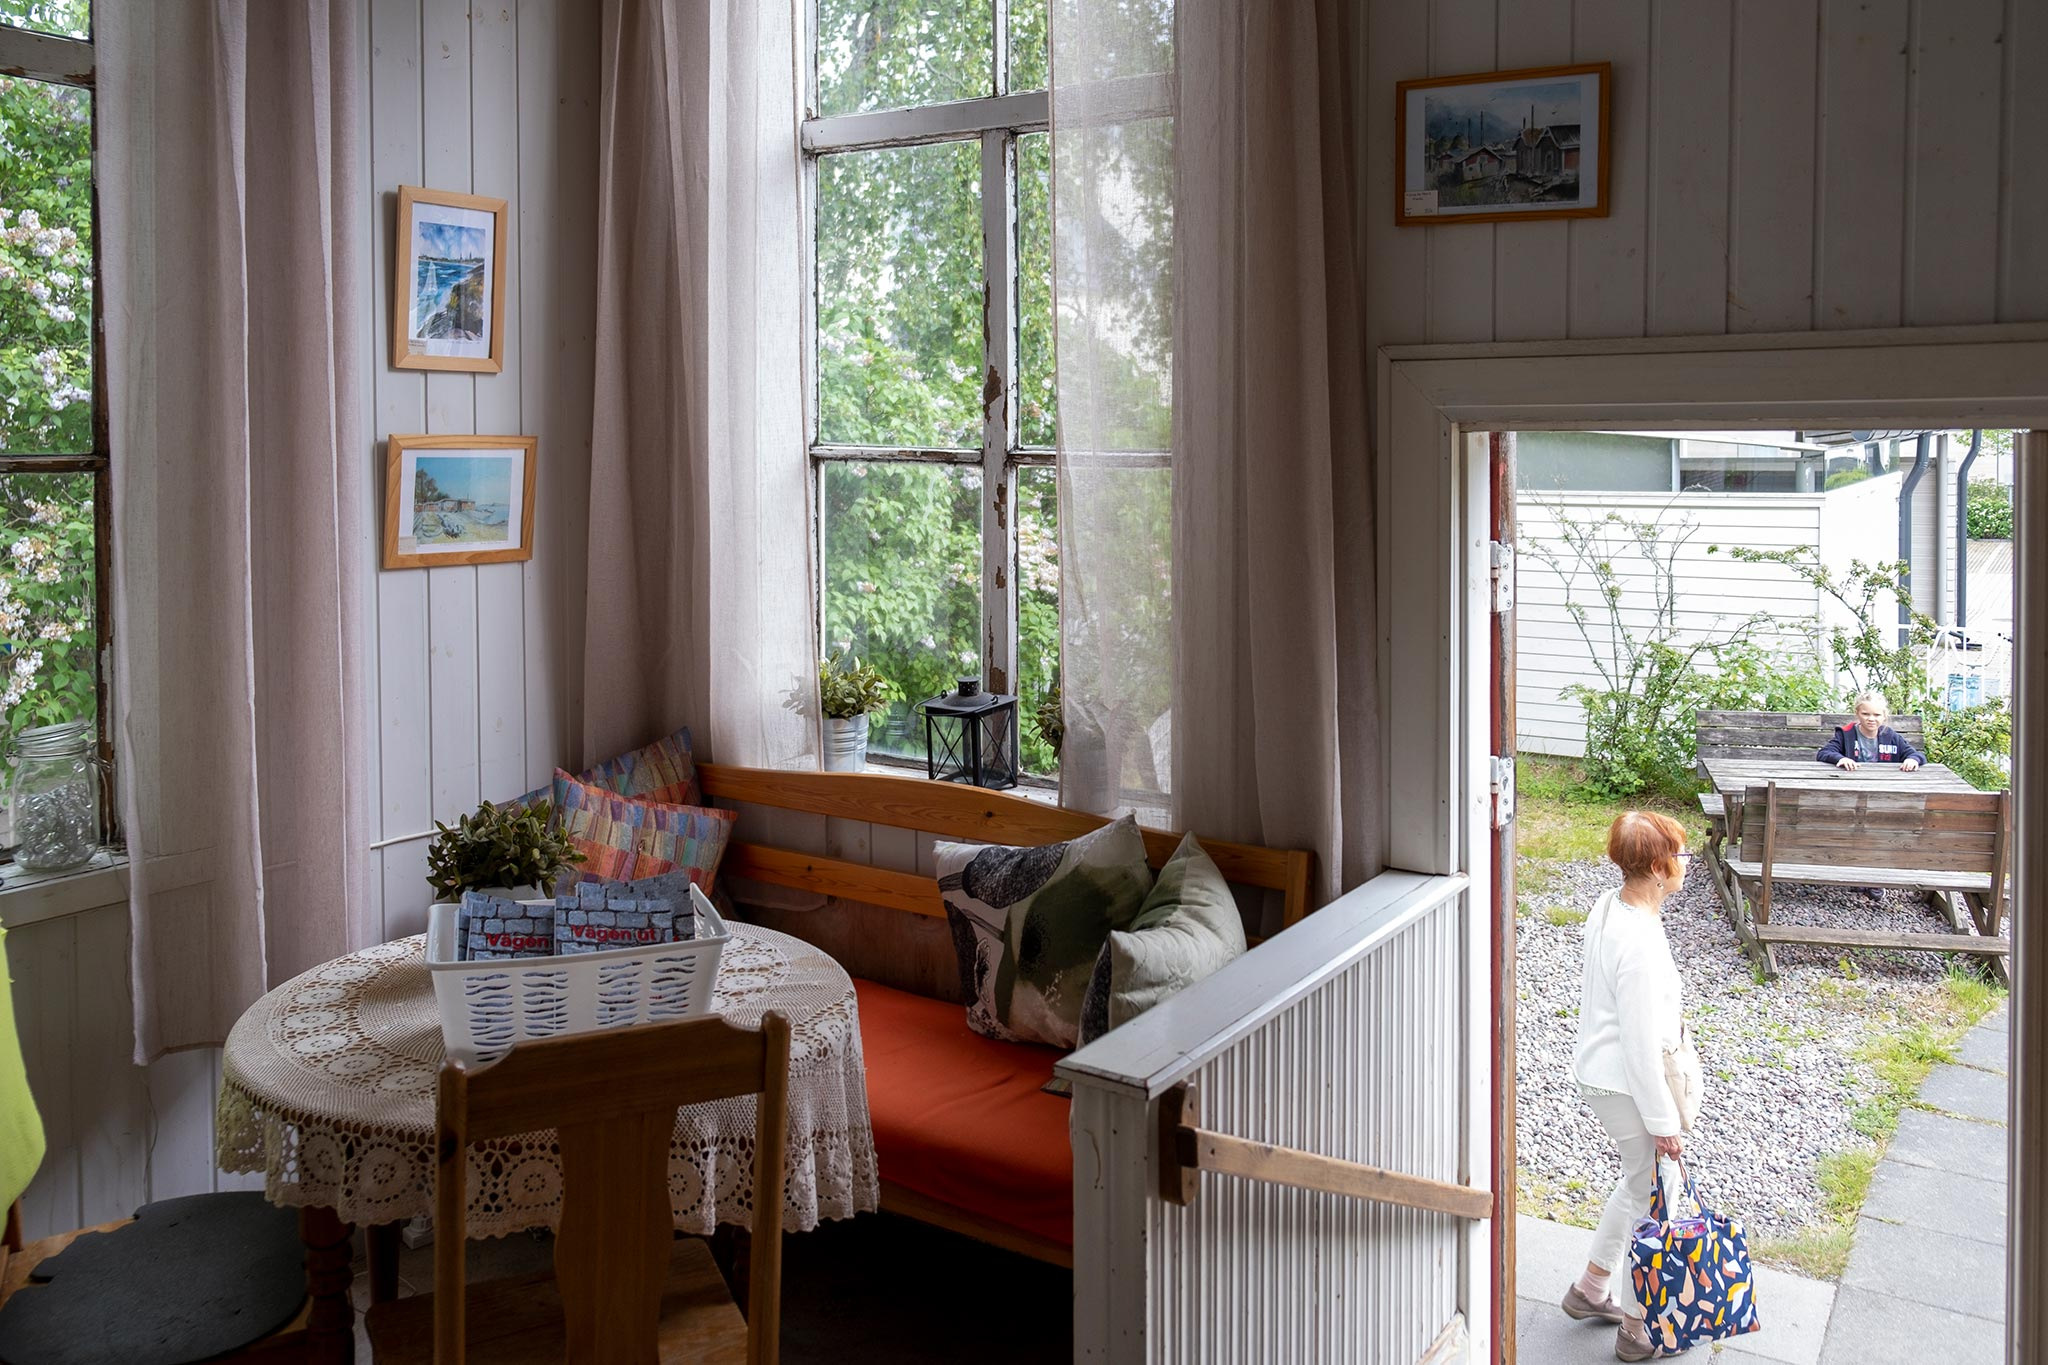 Alan's Cafe, Hanko © Tuulia Kolehmainen